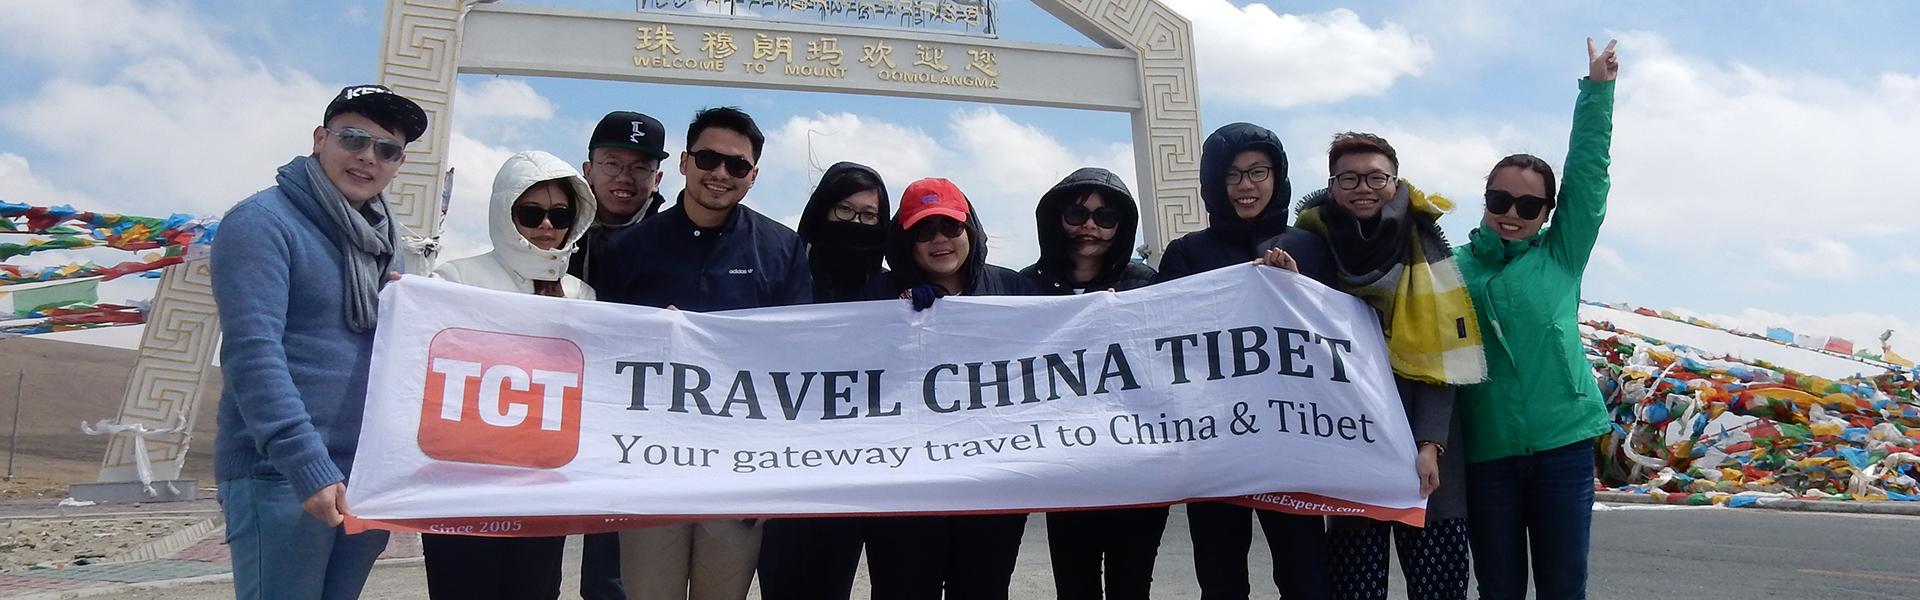 About TravelChinaTibet.com